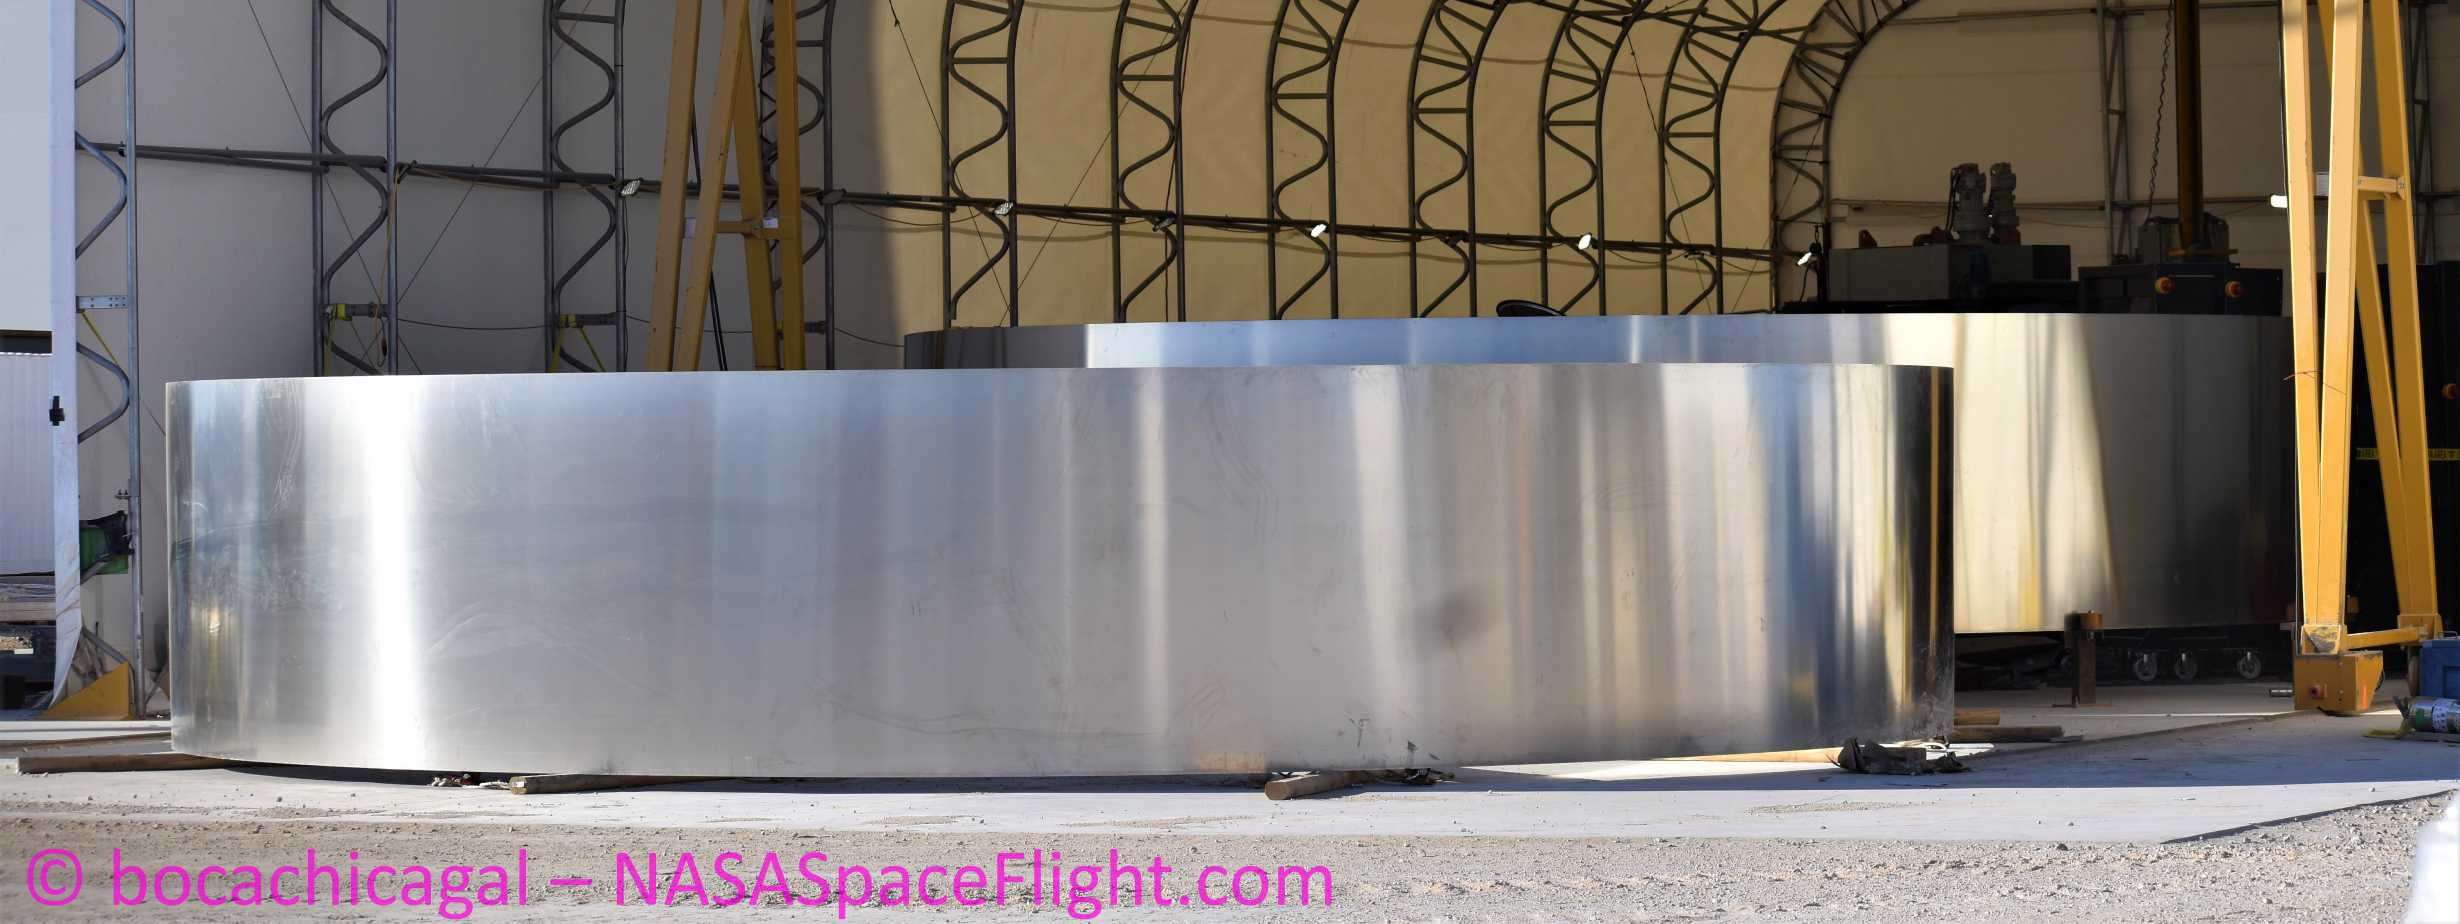 Starship Boca Chica 020620 (NASASpaceflight – bocachicagal) SN01 rings 1 crop (c)